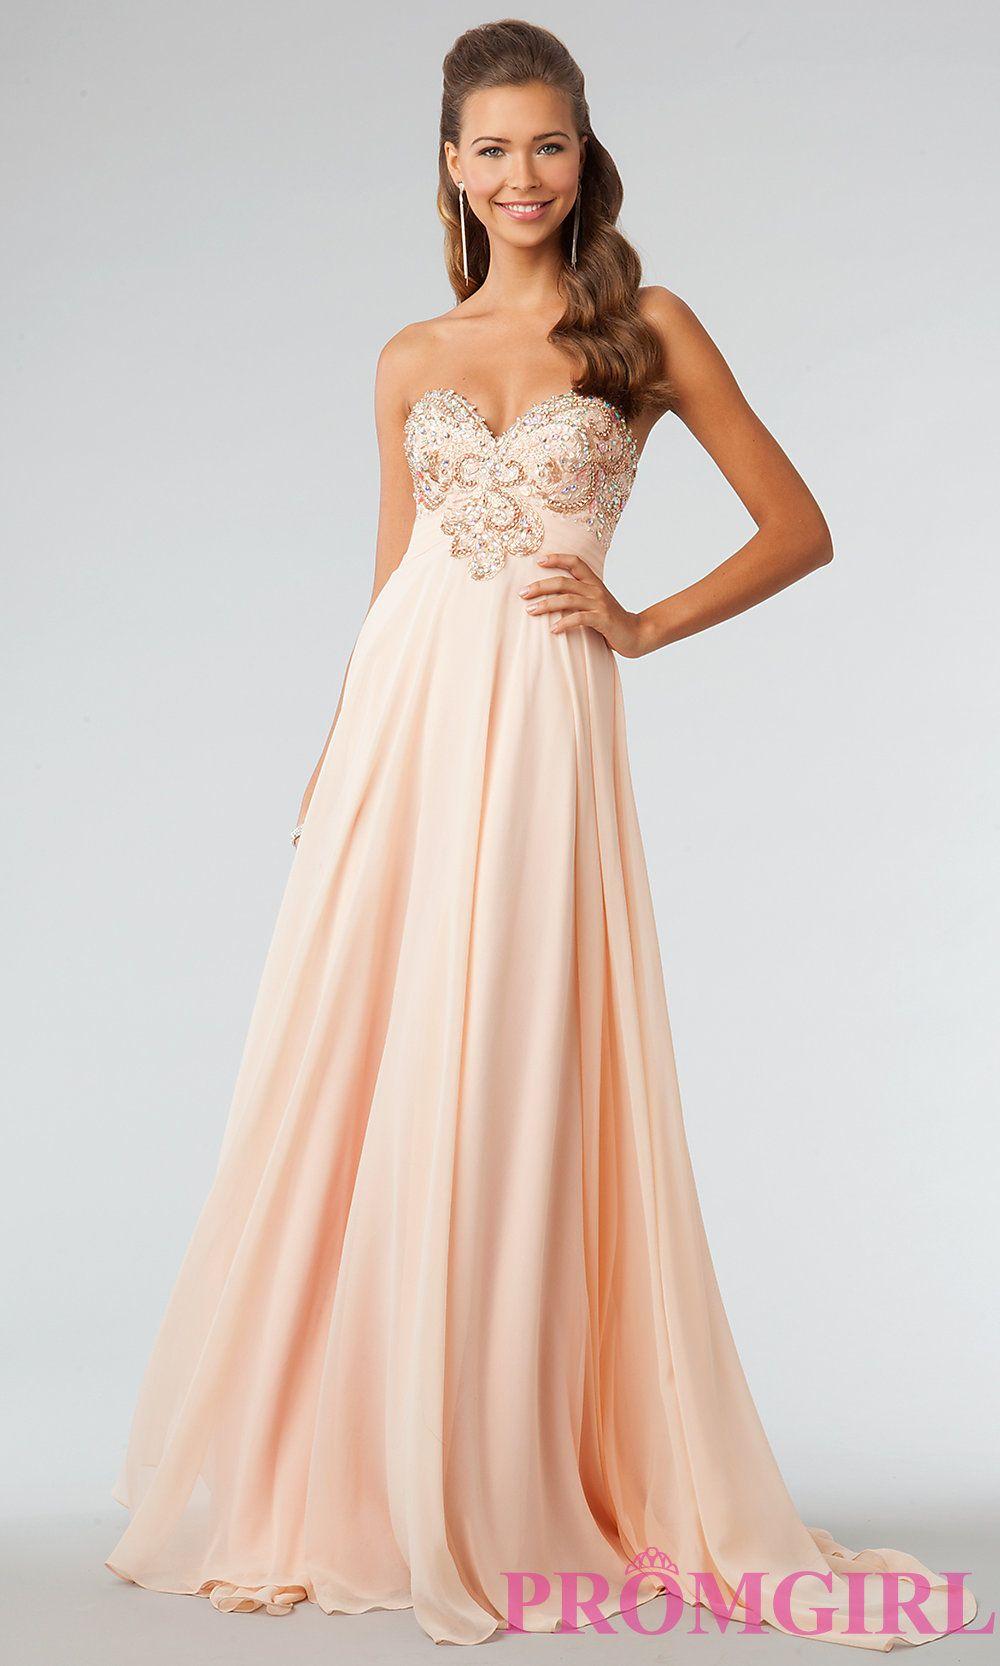 Long prom dress style jojvnjvn detail image prom dresses